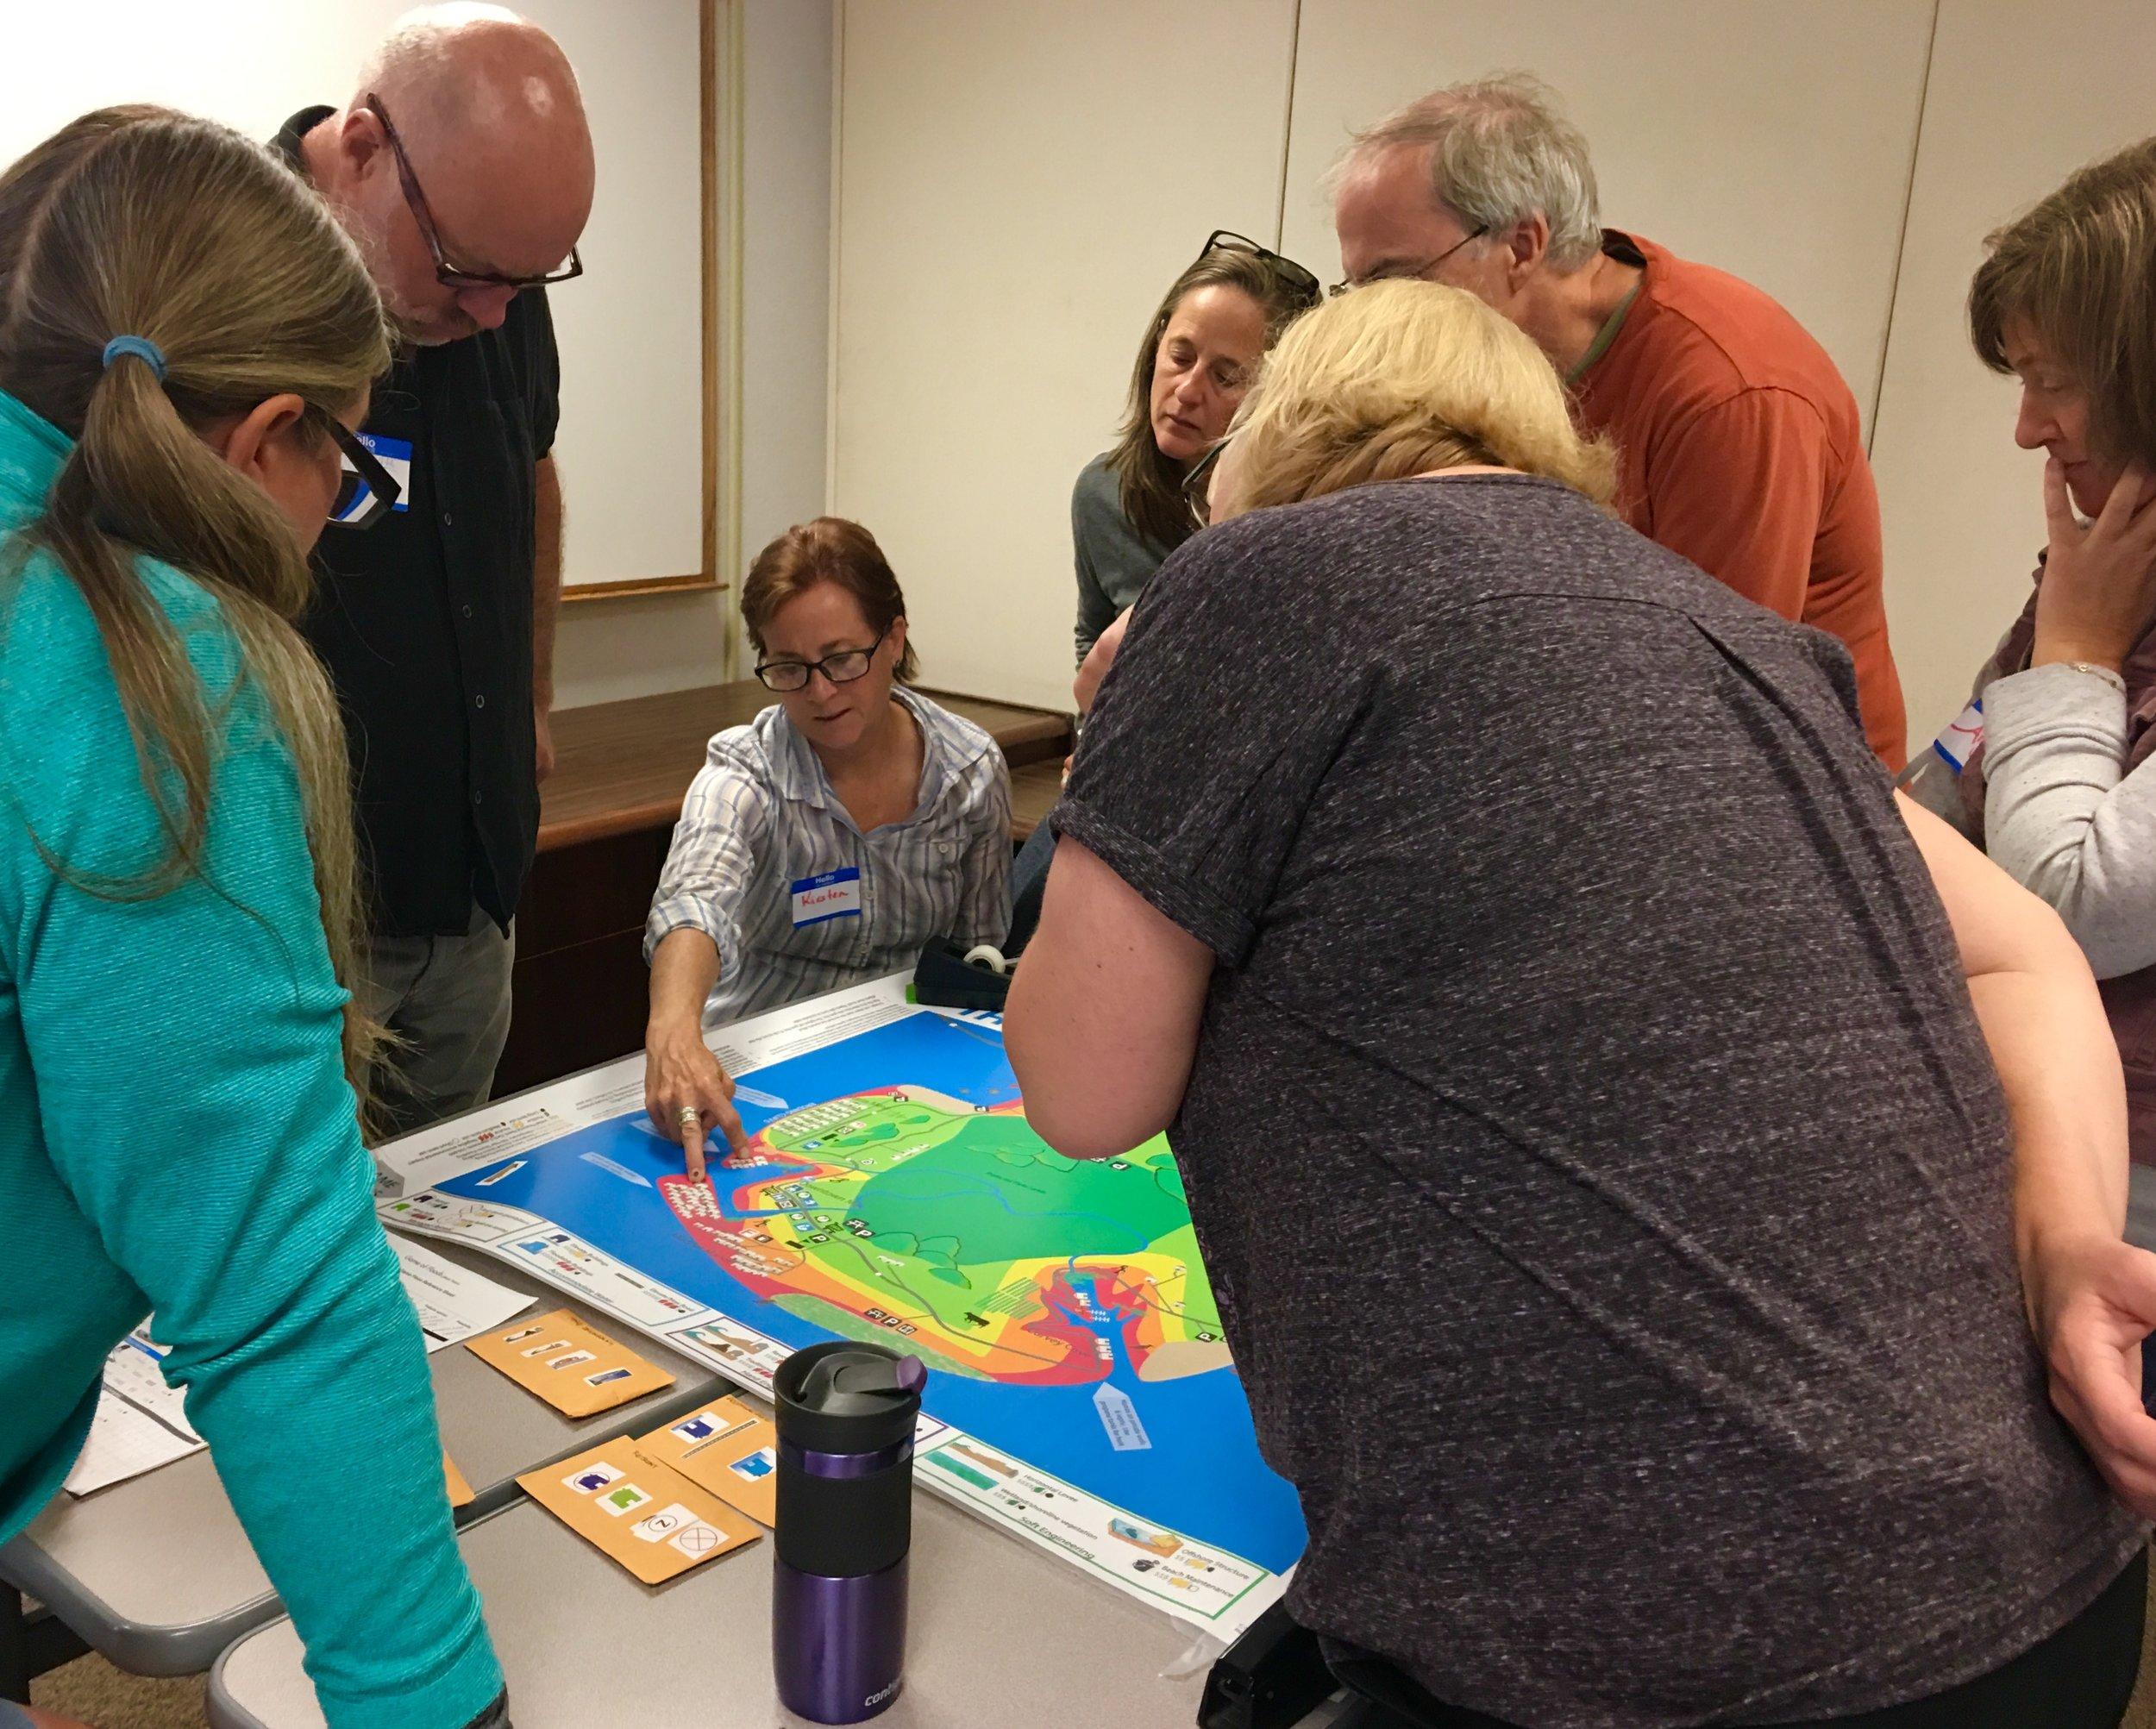 Teachers Play the Game of Floods